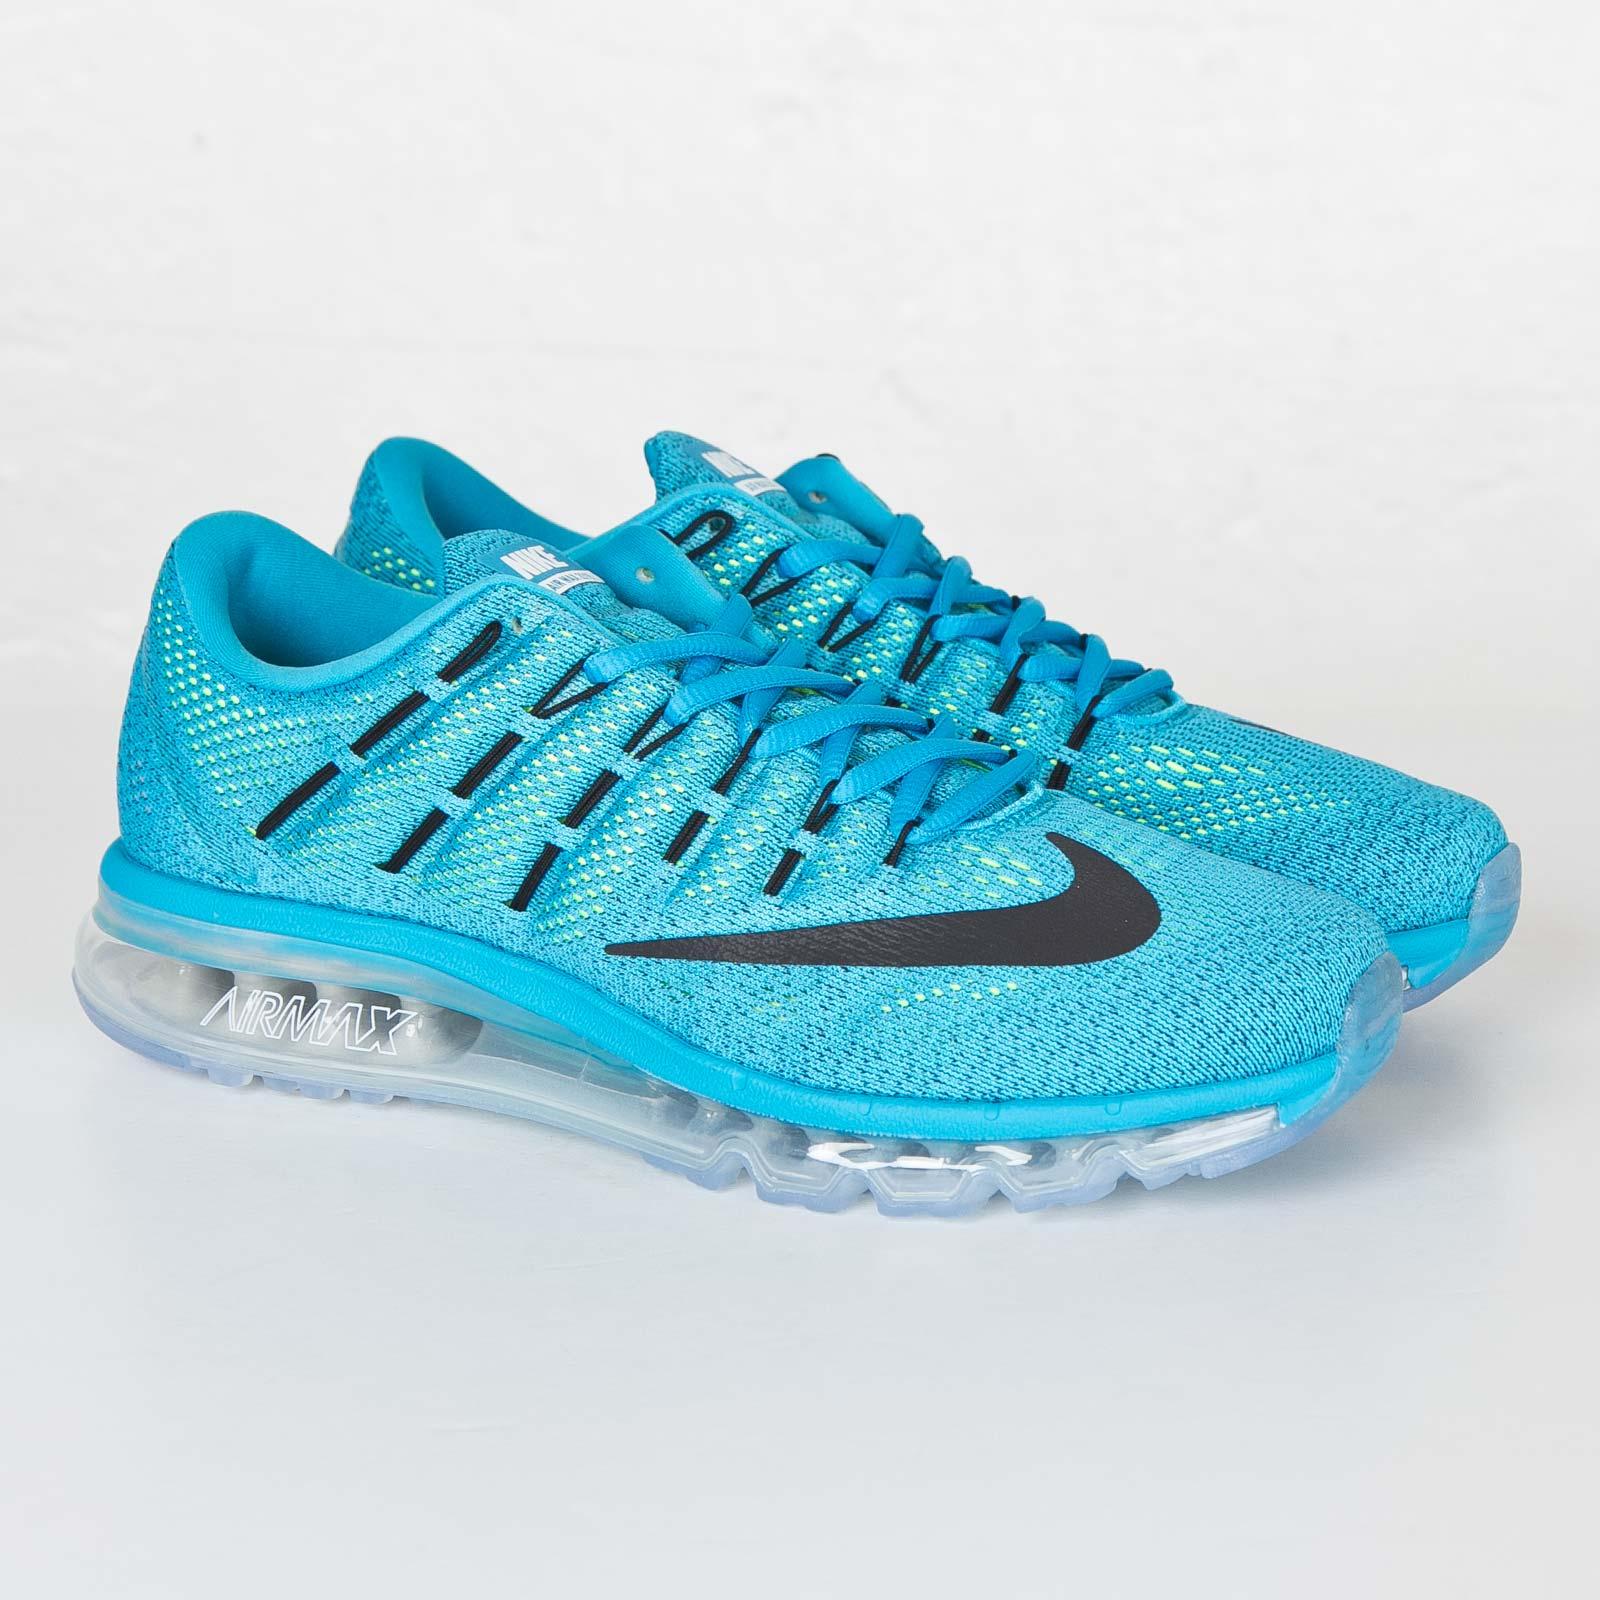 promo code f5ab6 45cb1 Nike Air Max 2016